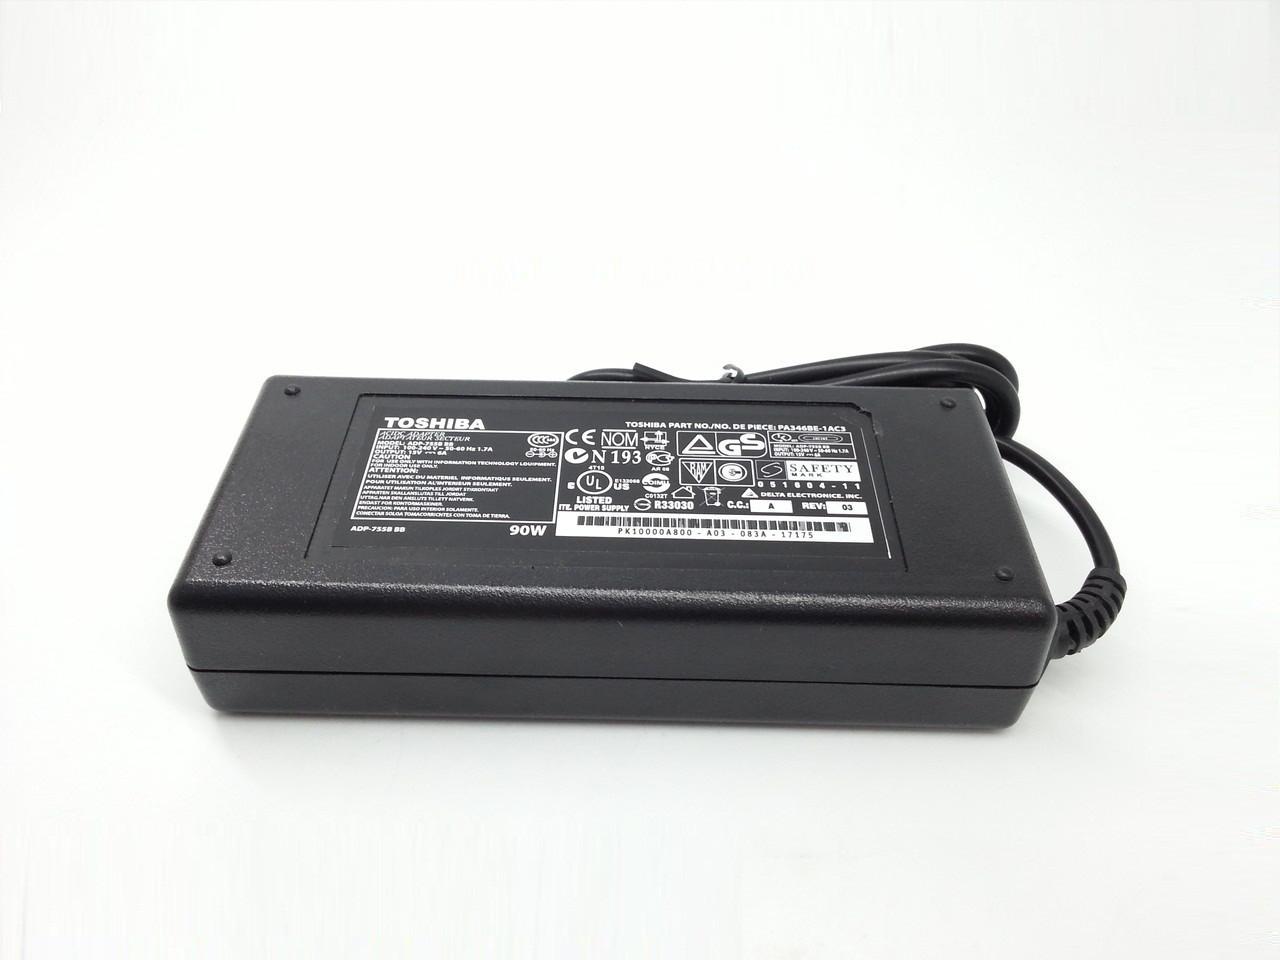 Блок питания для ноутбука Toshiba Satellite 2410-s203 15V 6A 90W 6.3*3.0mm